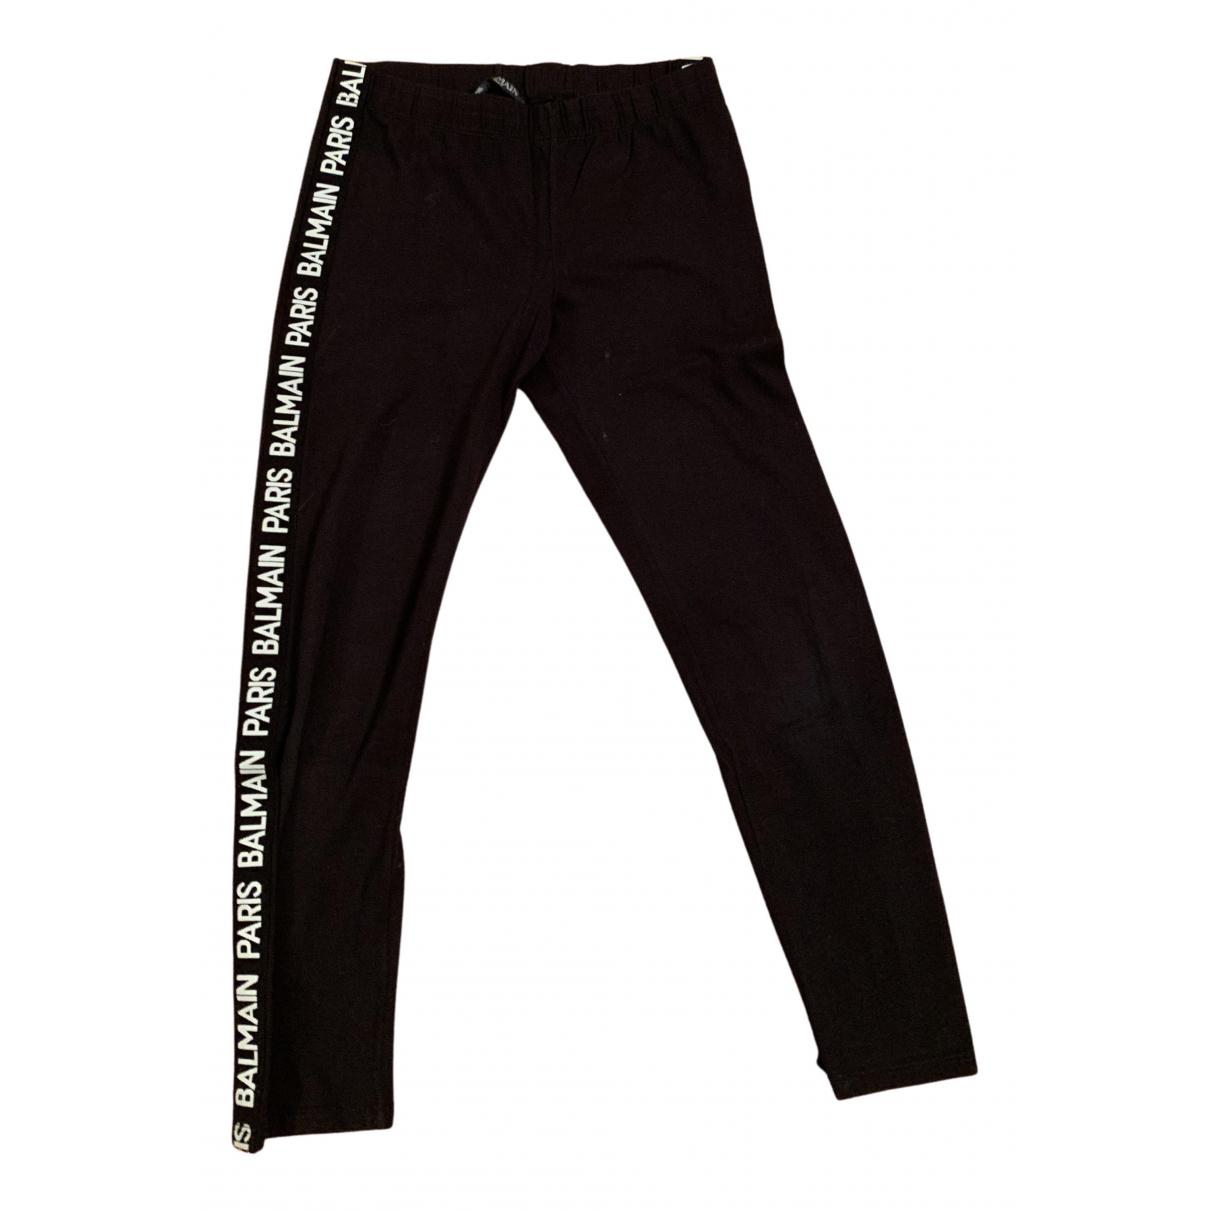 Balmain N Black Cotton Trousers for Kids 12 years - XS FR